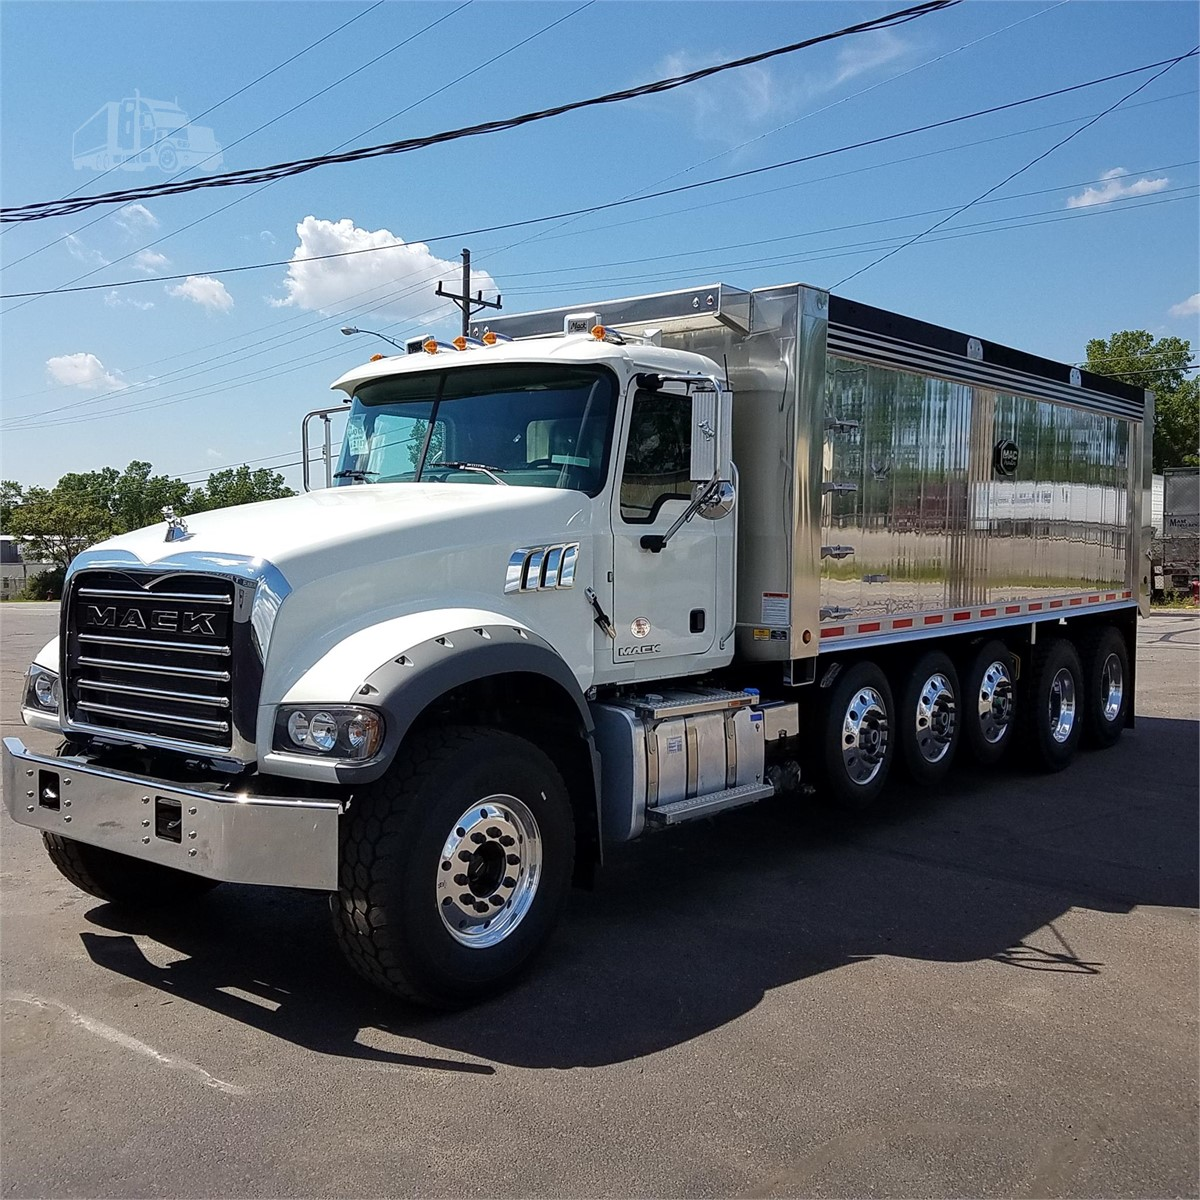 Pickup Trucks 2019: 2019 MACK GRANITE GU713 For Sale In Canton, Ohio